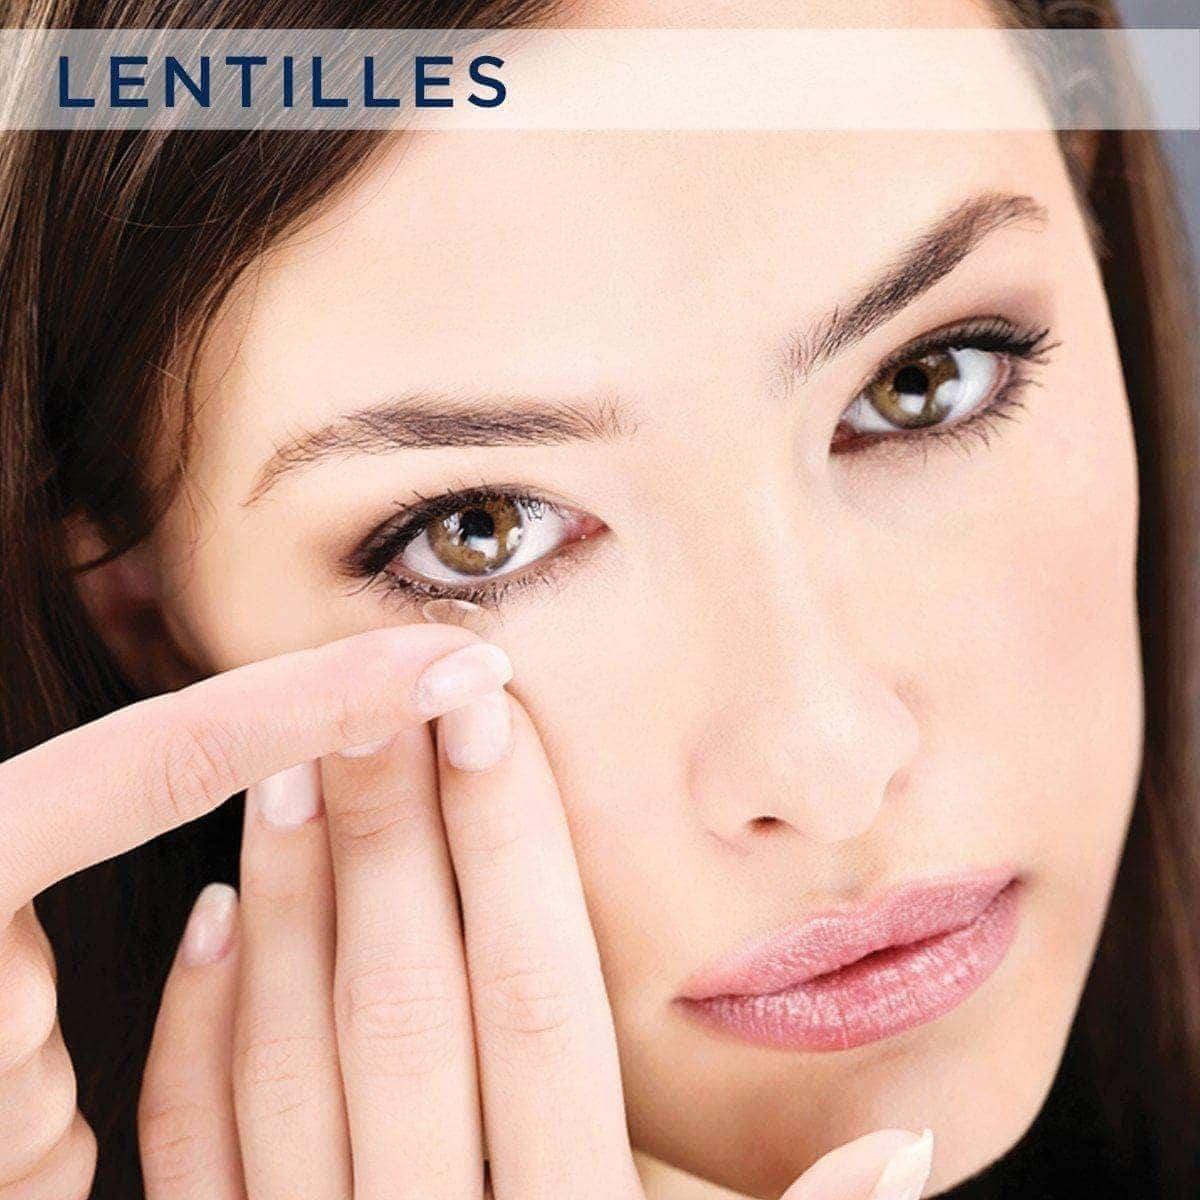 lentilles optica muralla